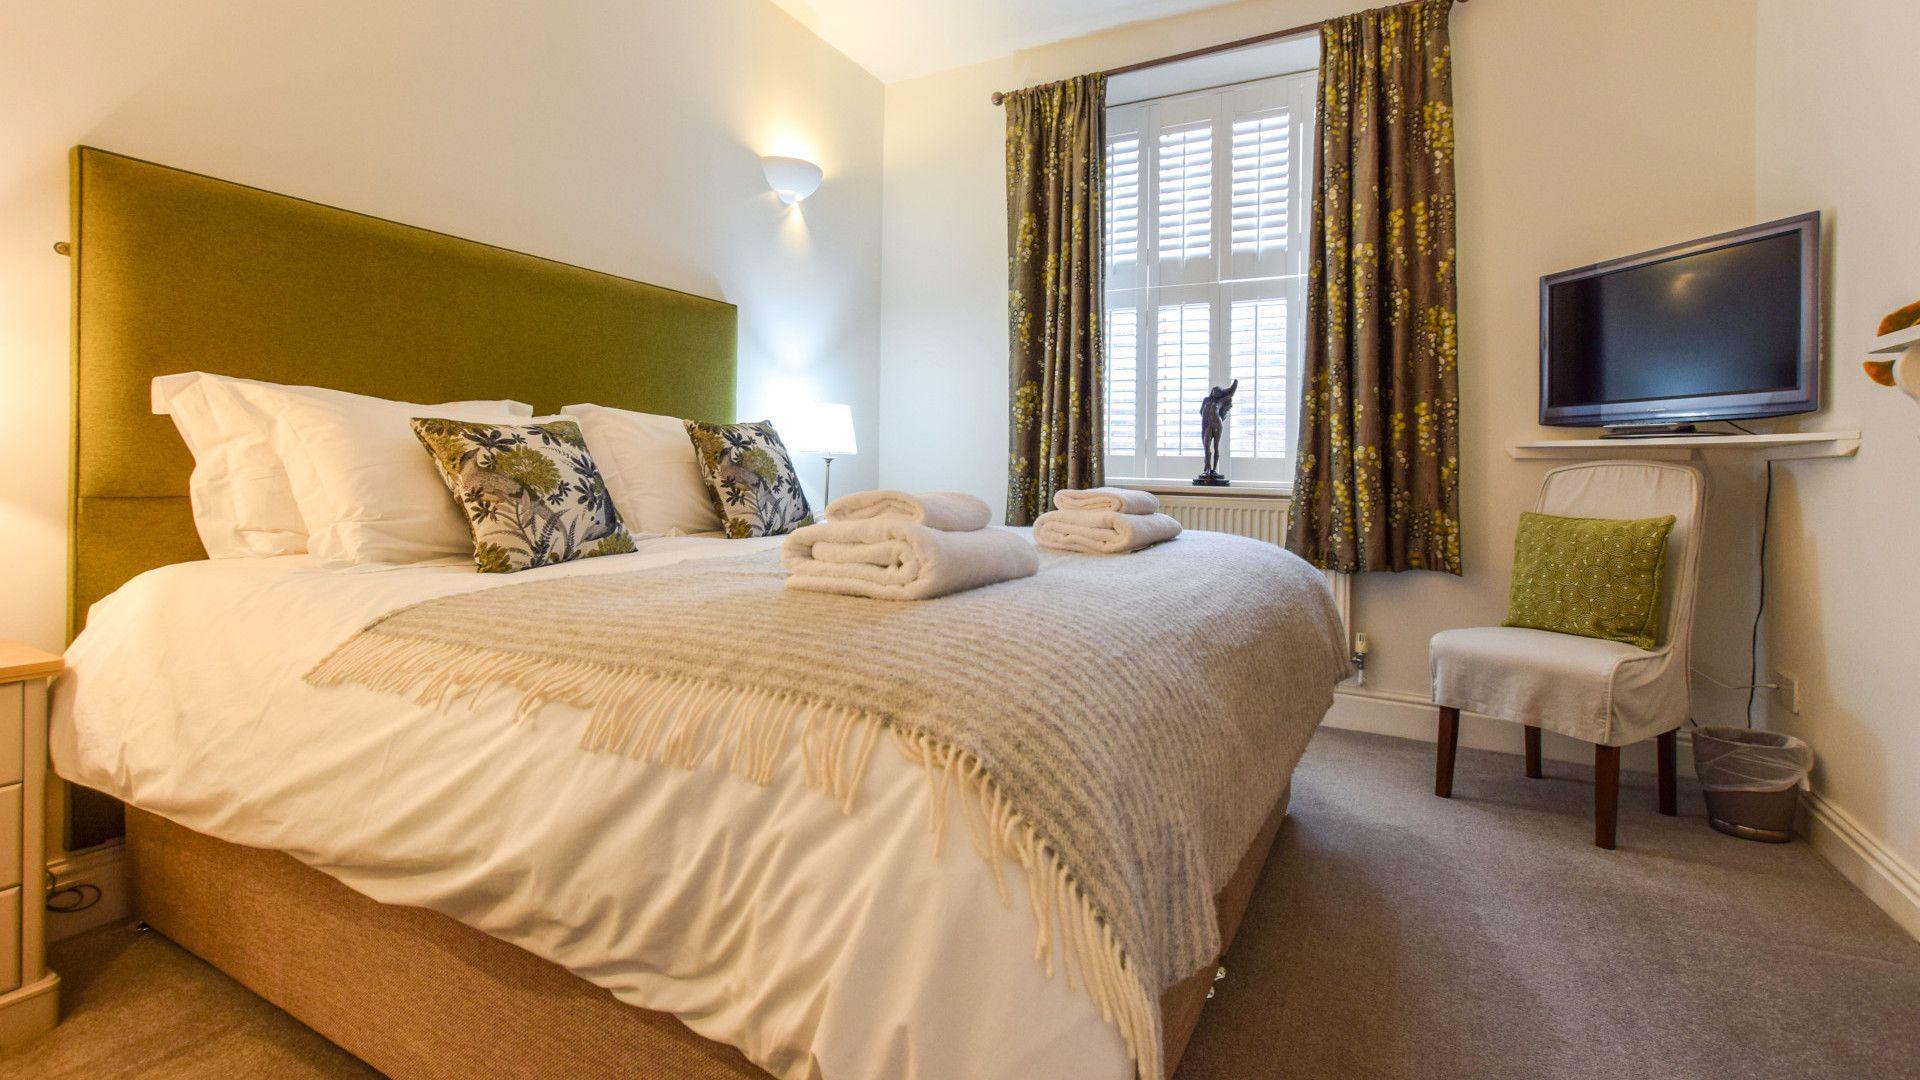 Bedroom, Bishop's, Bolthole Retreats